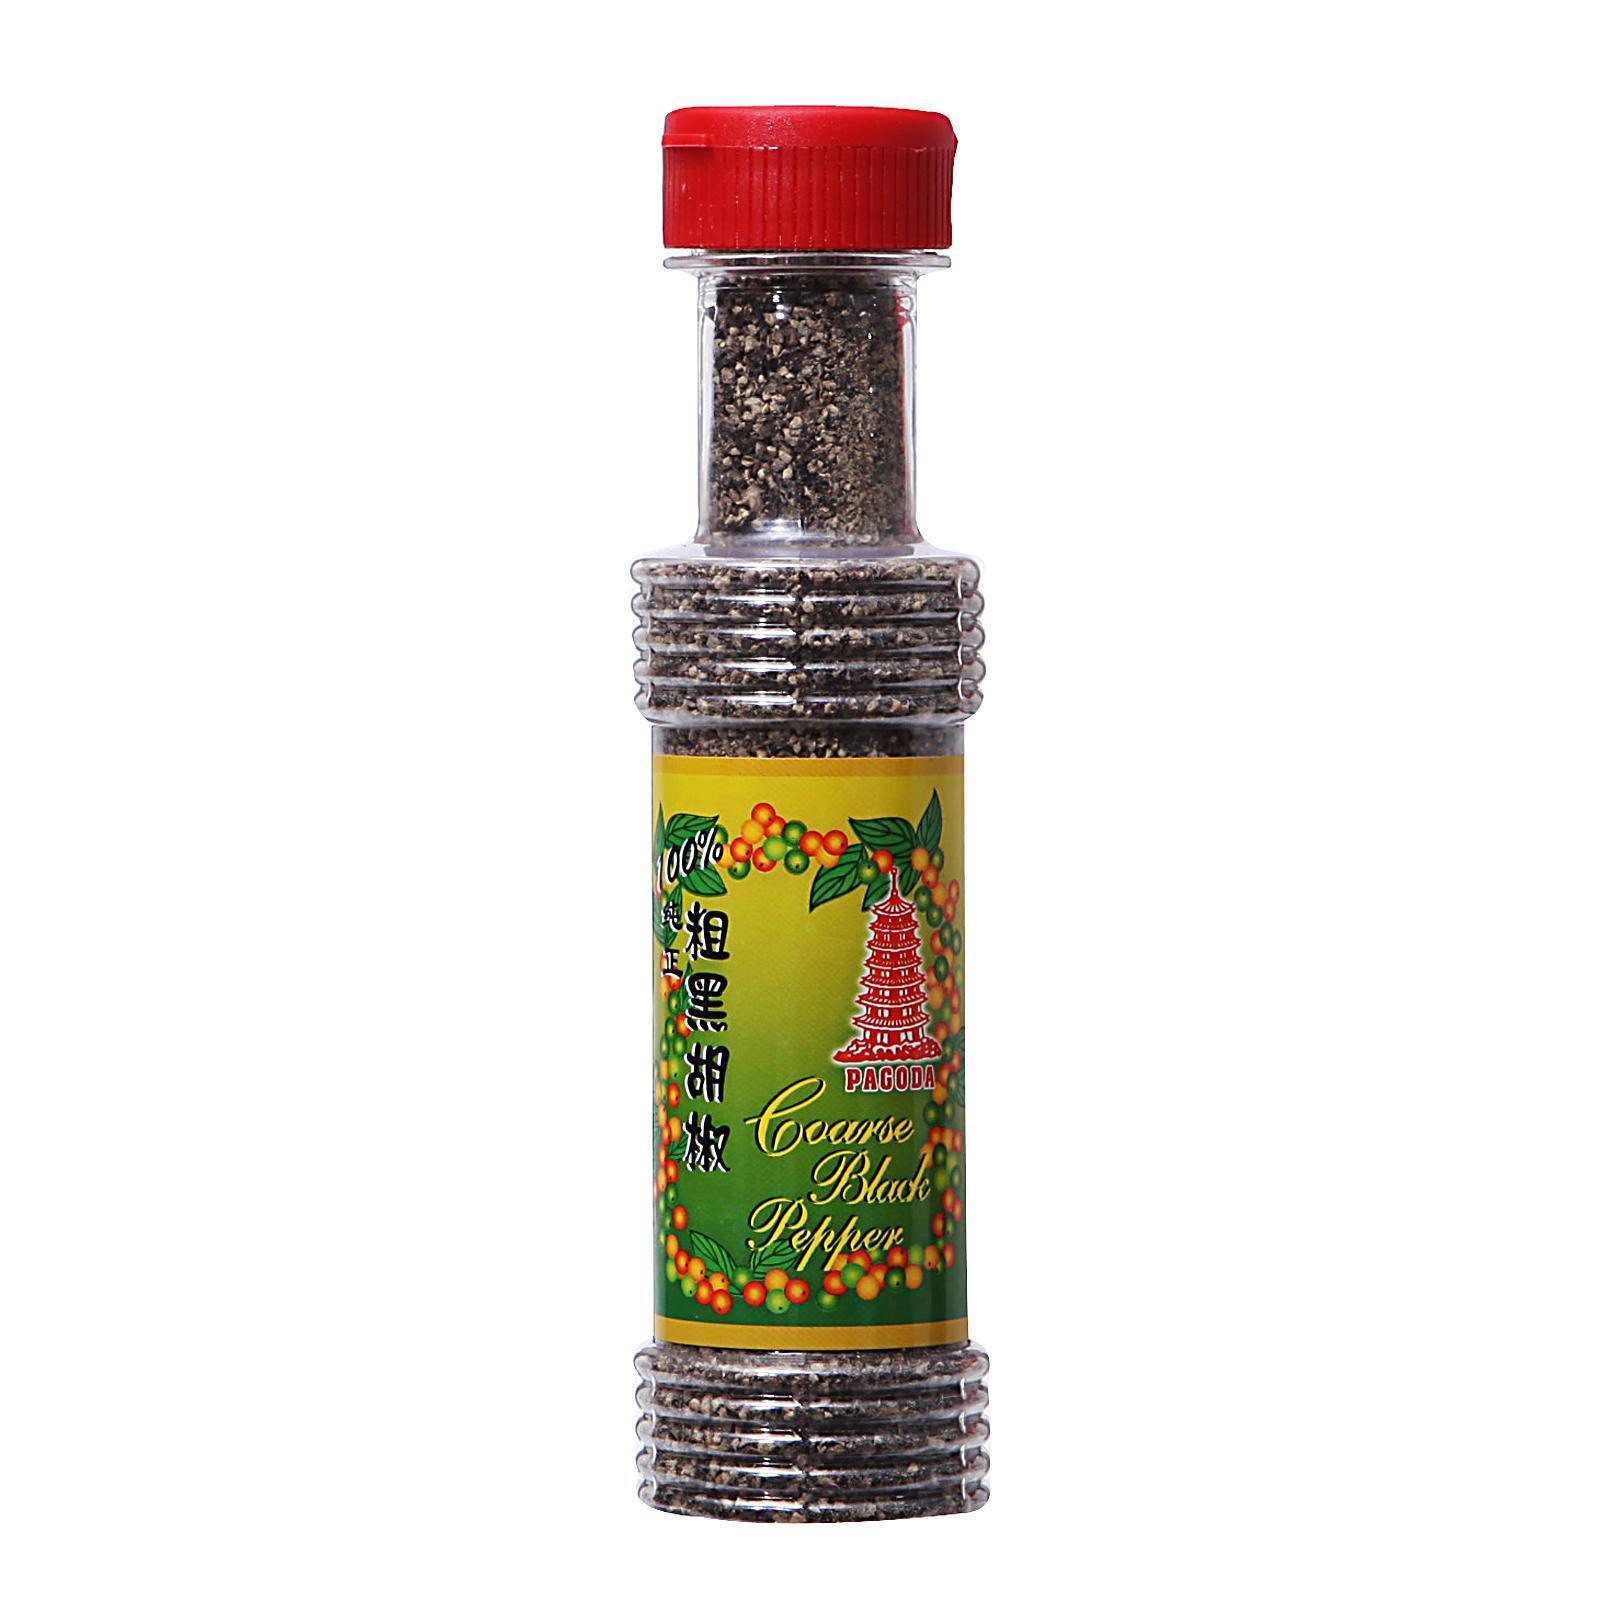 PAGODA BRAND Coarse Black Pepper 80g